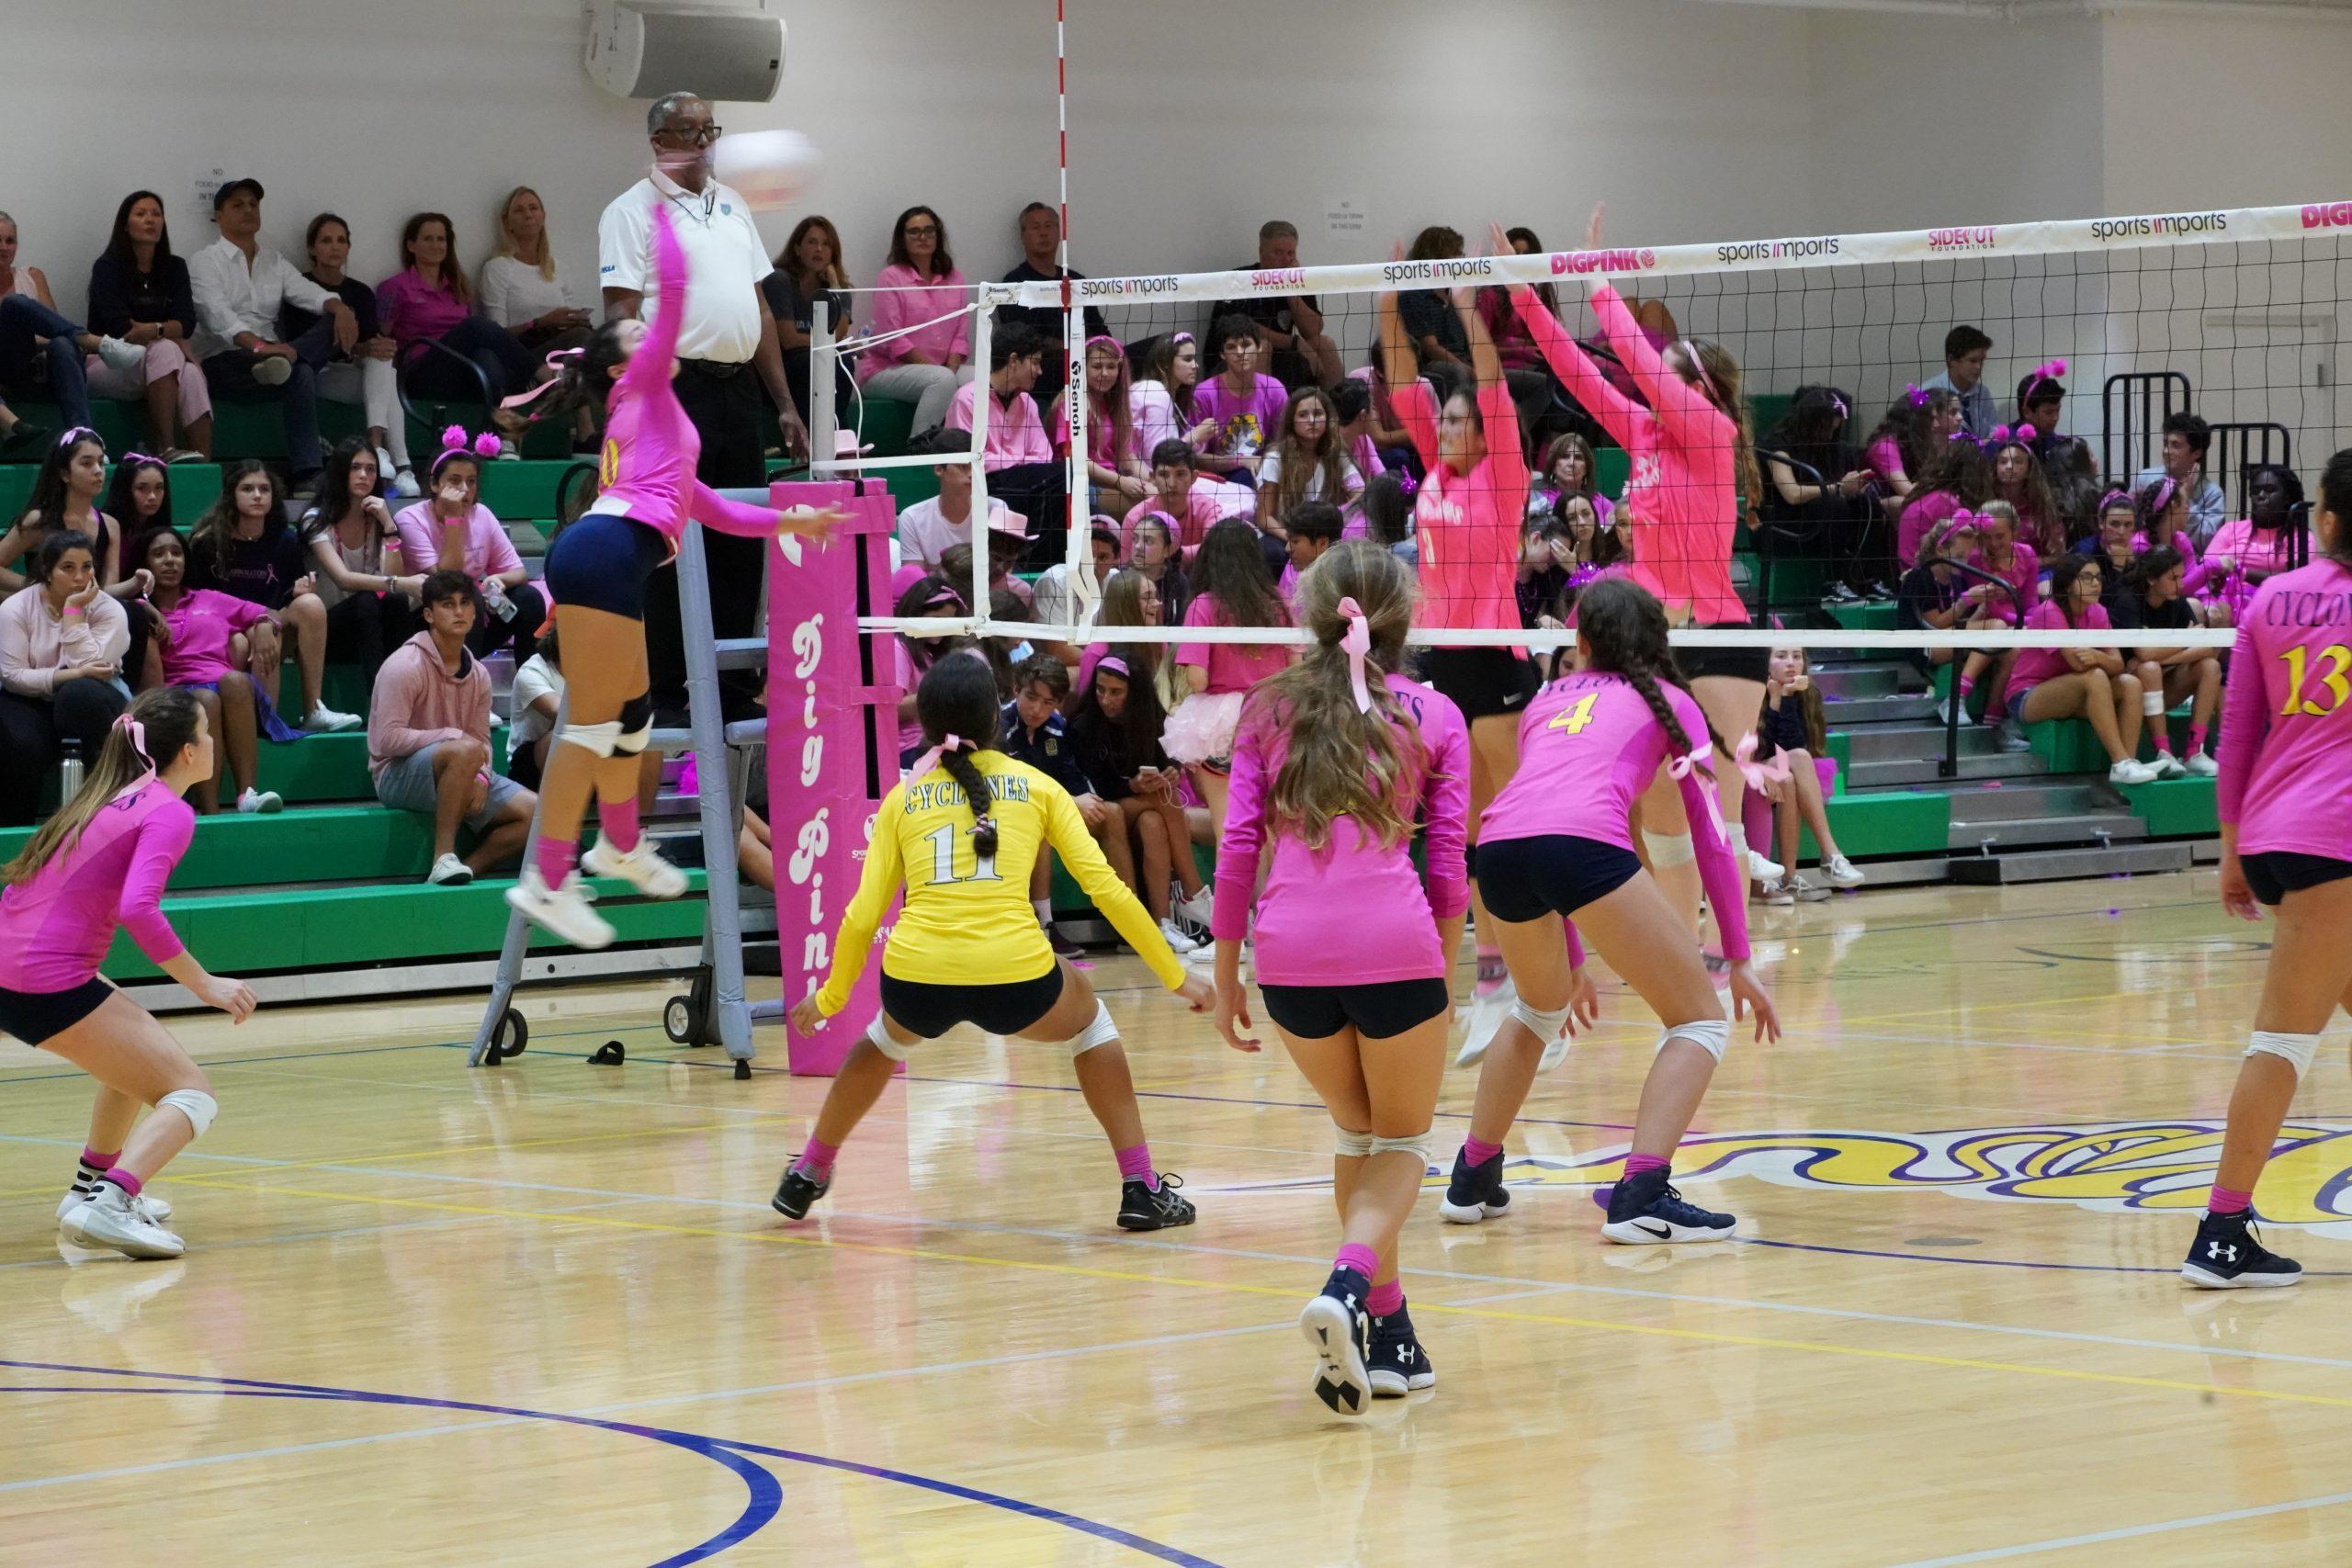 Carrollton Dig Pink Match